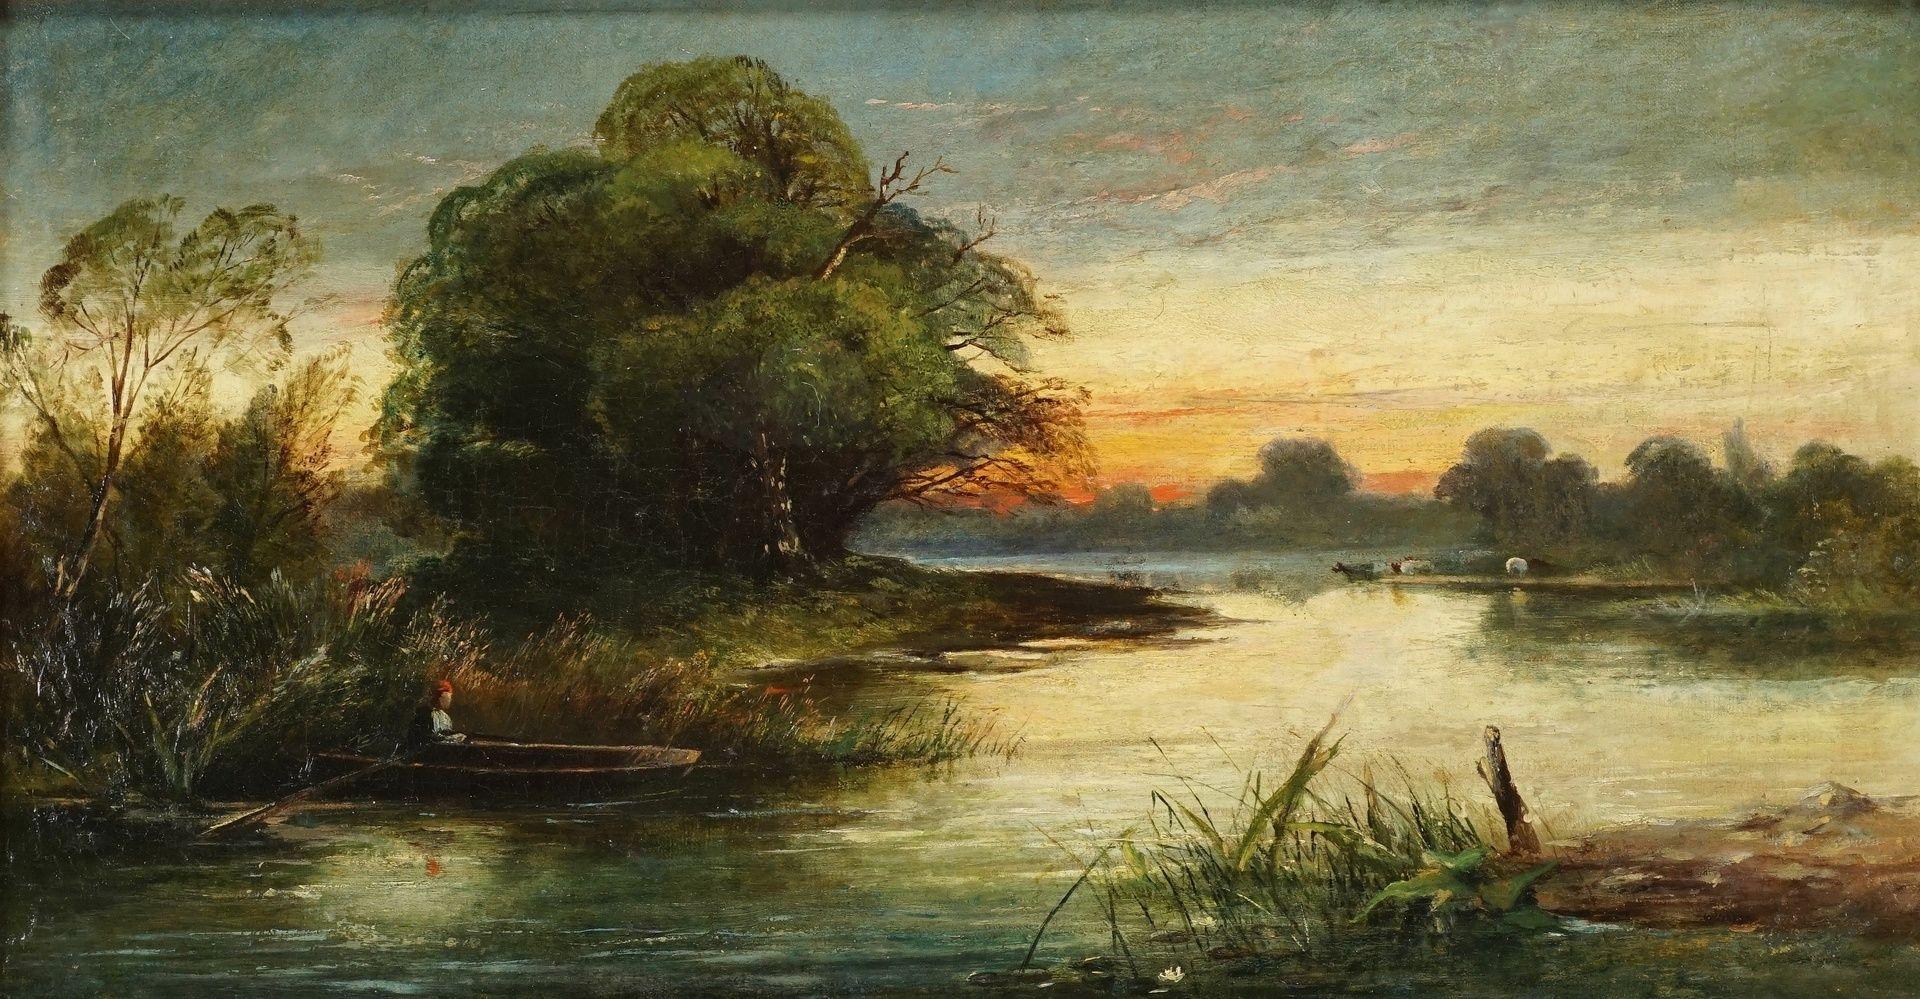 Charles-Francois Daubigny, Abenddämmerung über der Oise